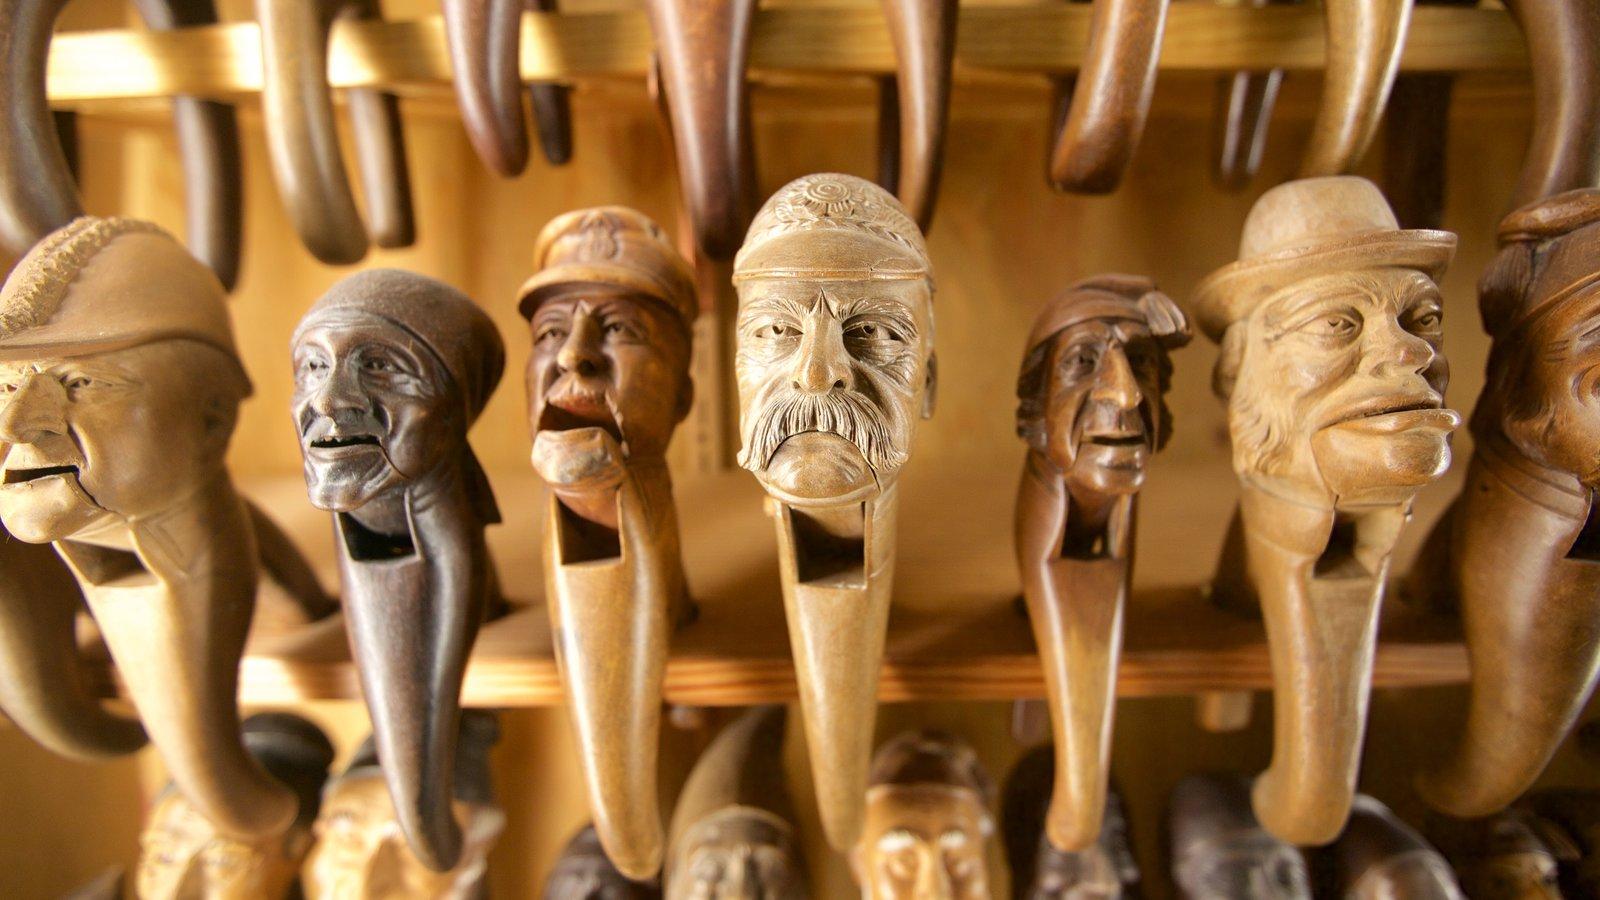 Leavenworth Nutcracker Museum que inclui compras e vistas internas